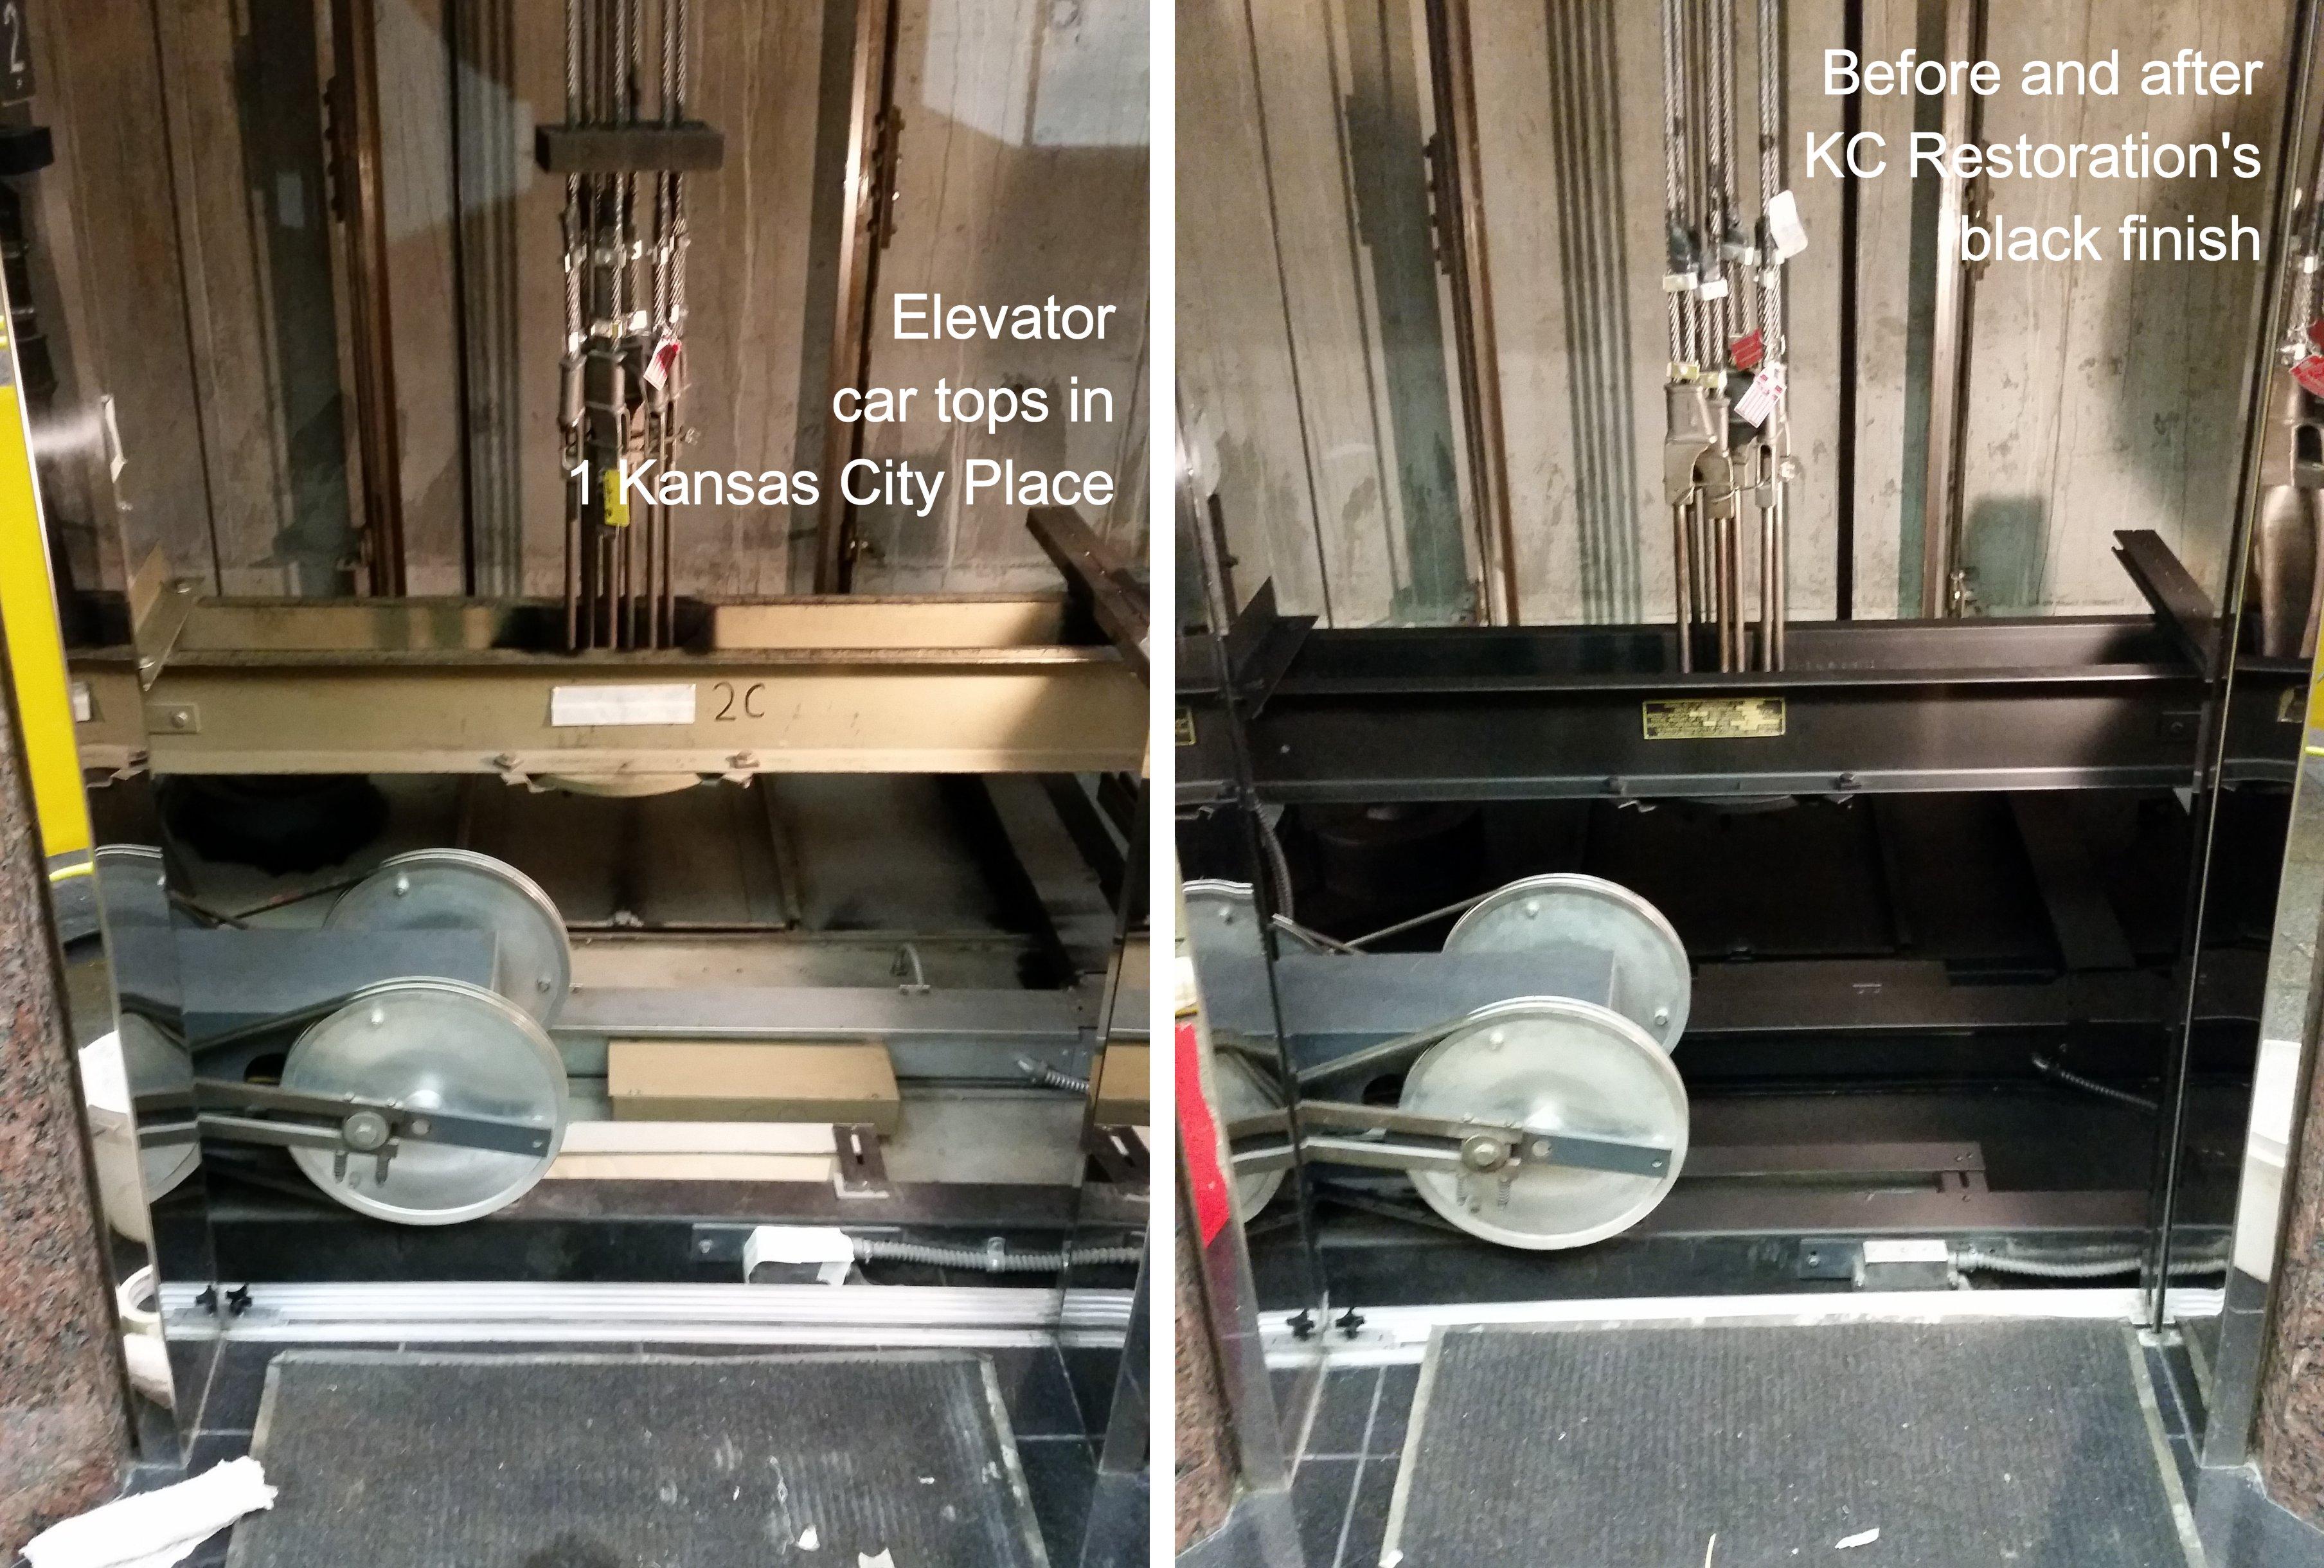 Elevator work